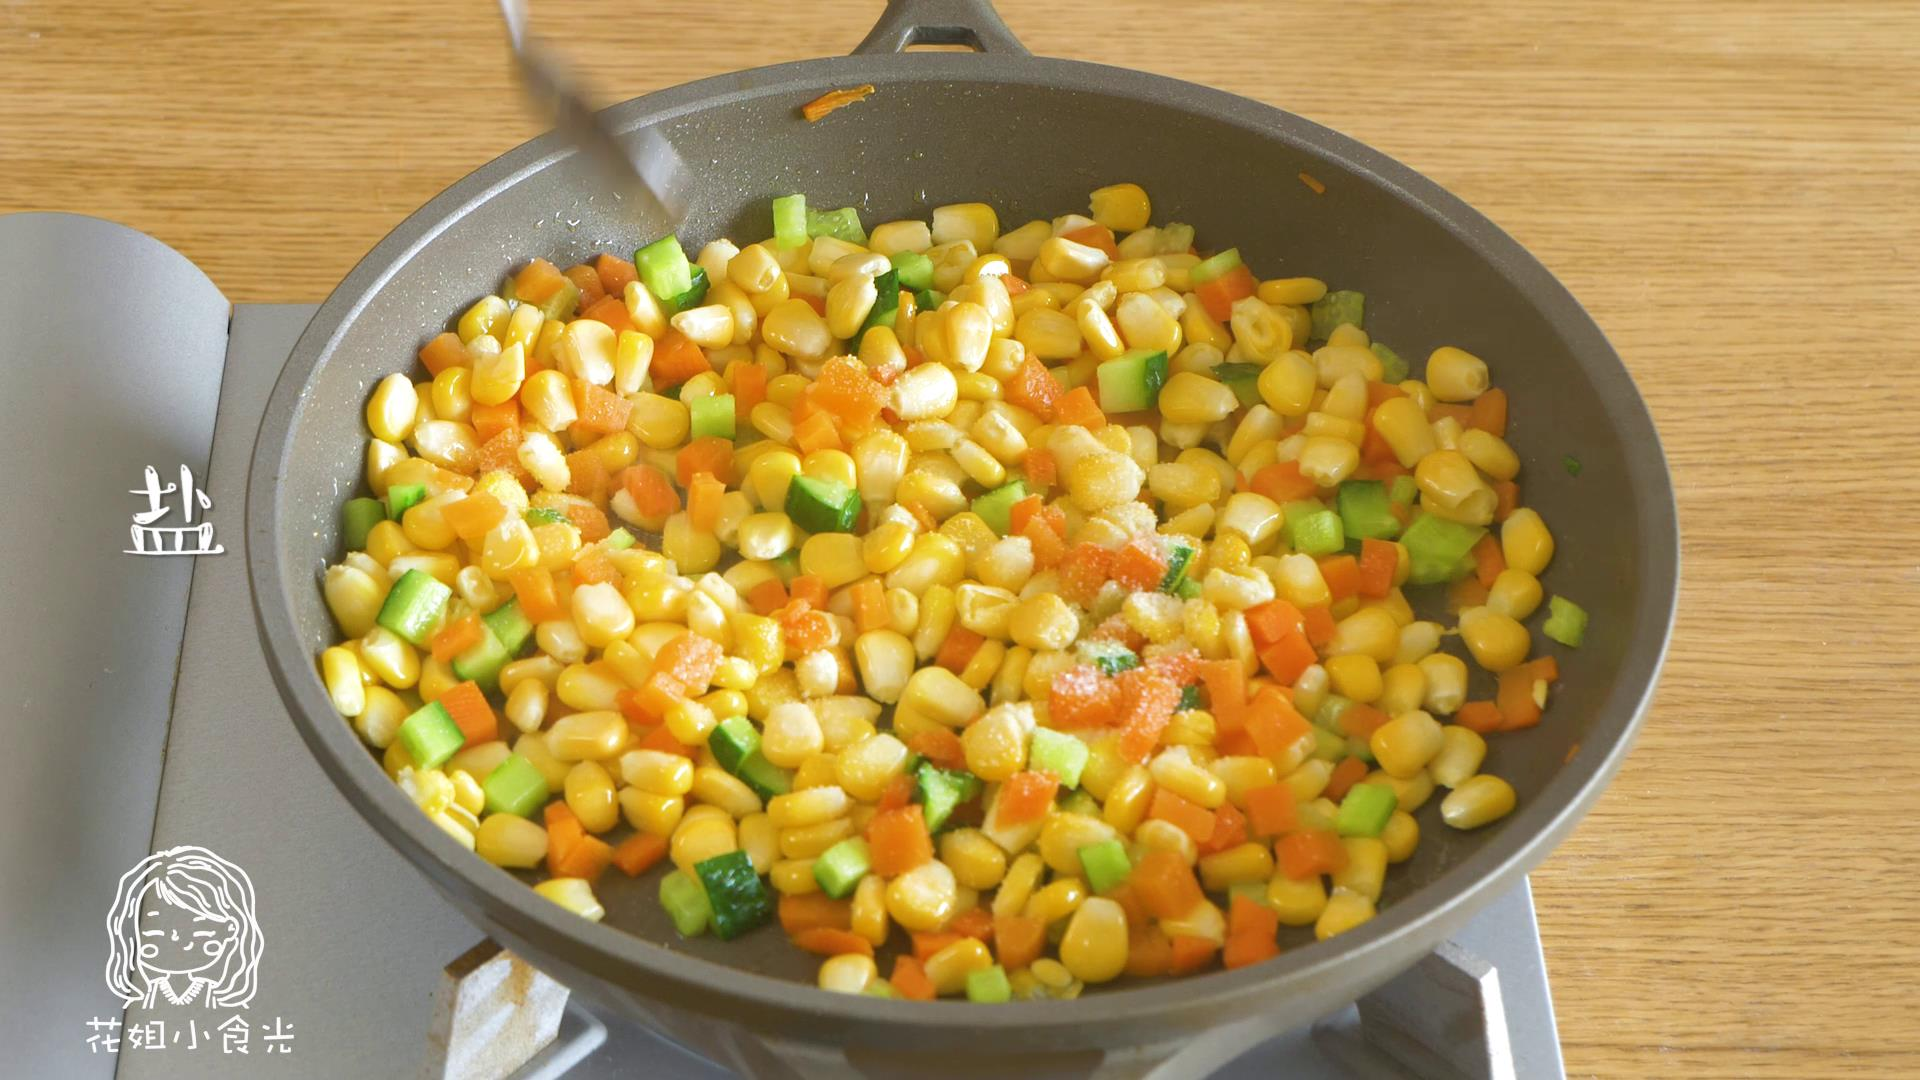 24m+松仁玉米,加盐、糖之后,翻炒均匀之后盛出~</p> <p>